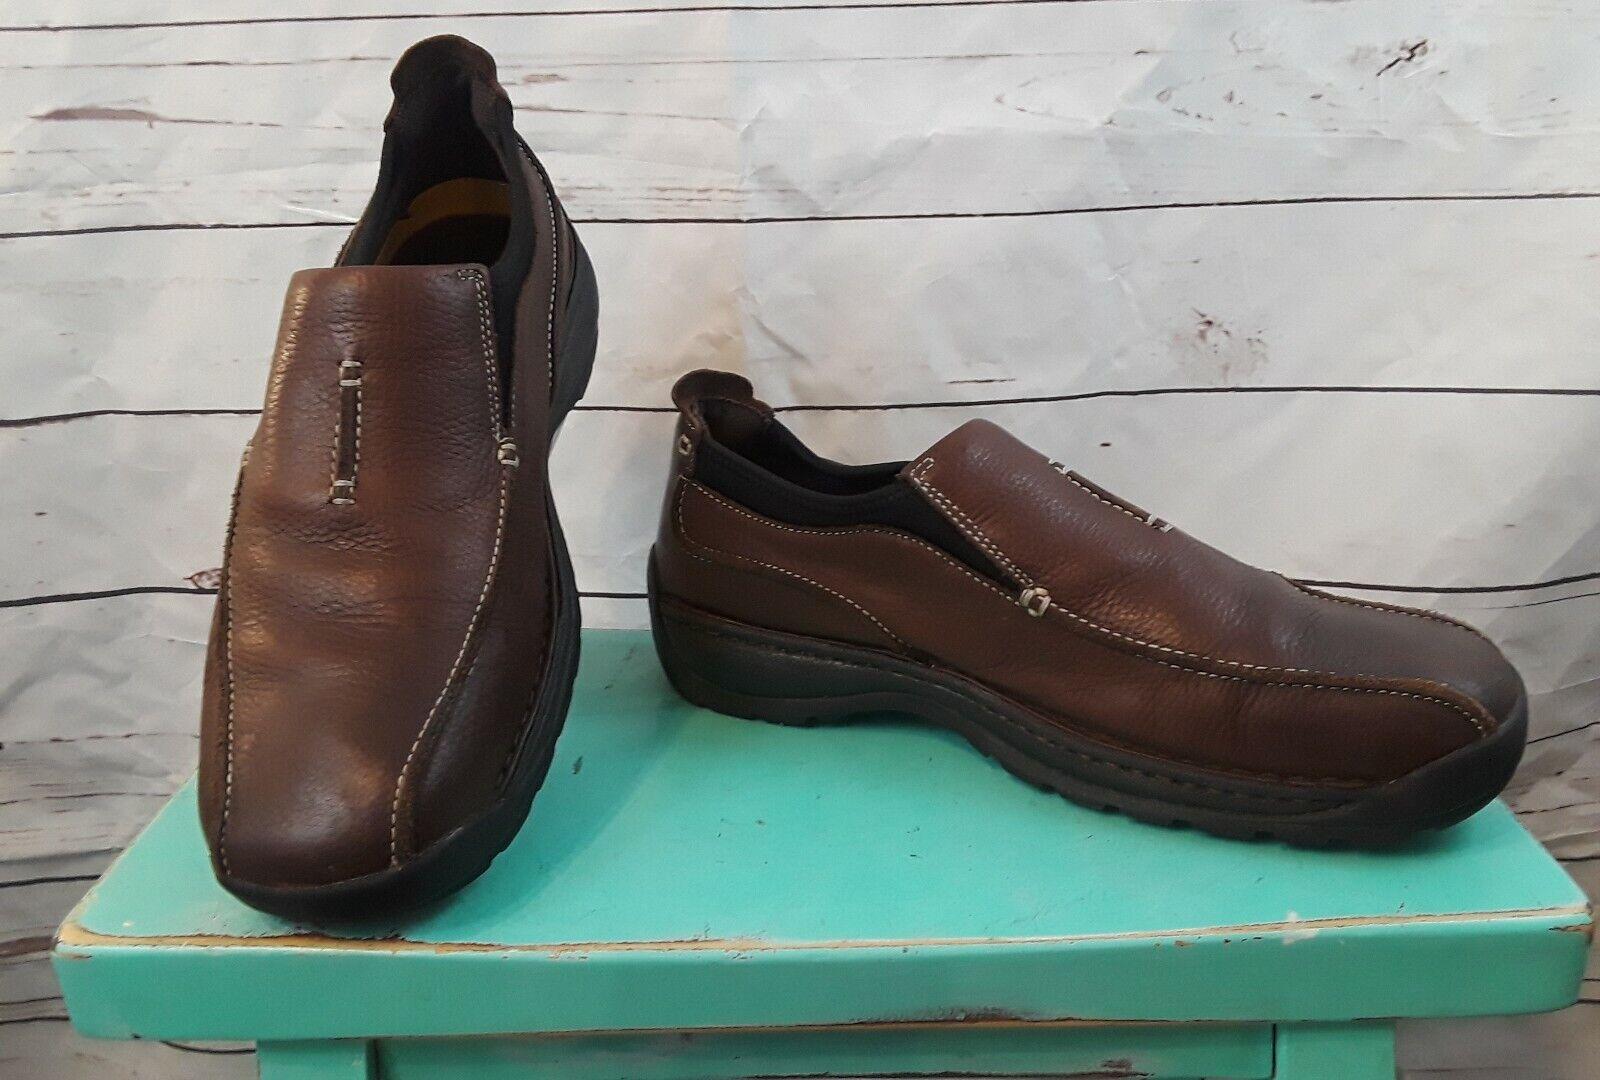 Skechers Men shoes 12 Slip On Casual Loafer Walking Leather Brown